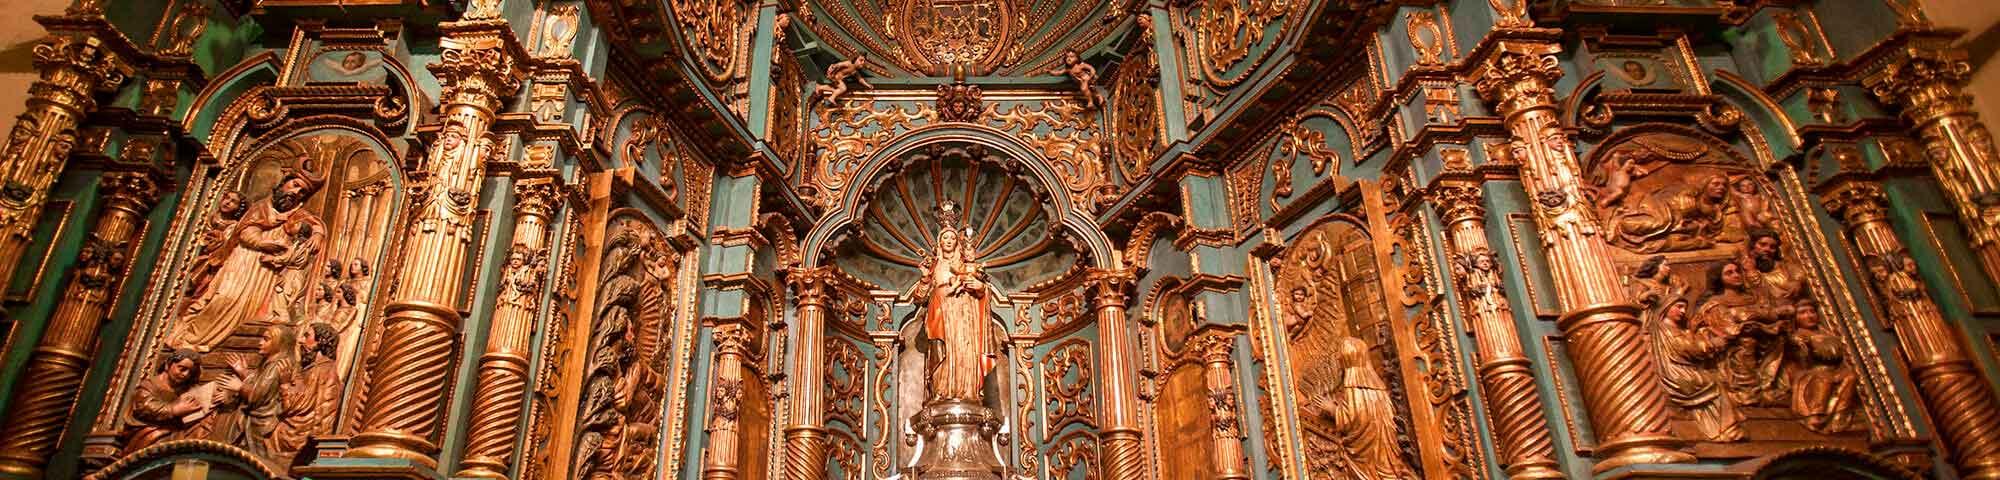 Iglesia Matriz Purísima Inmaculada Concepción